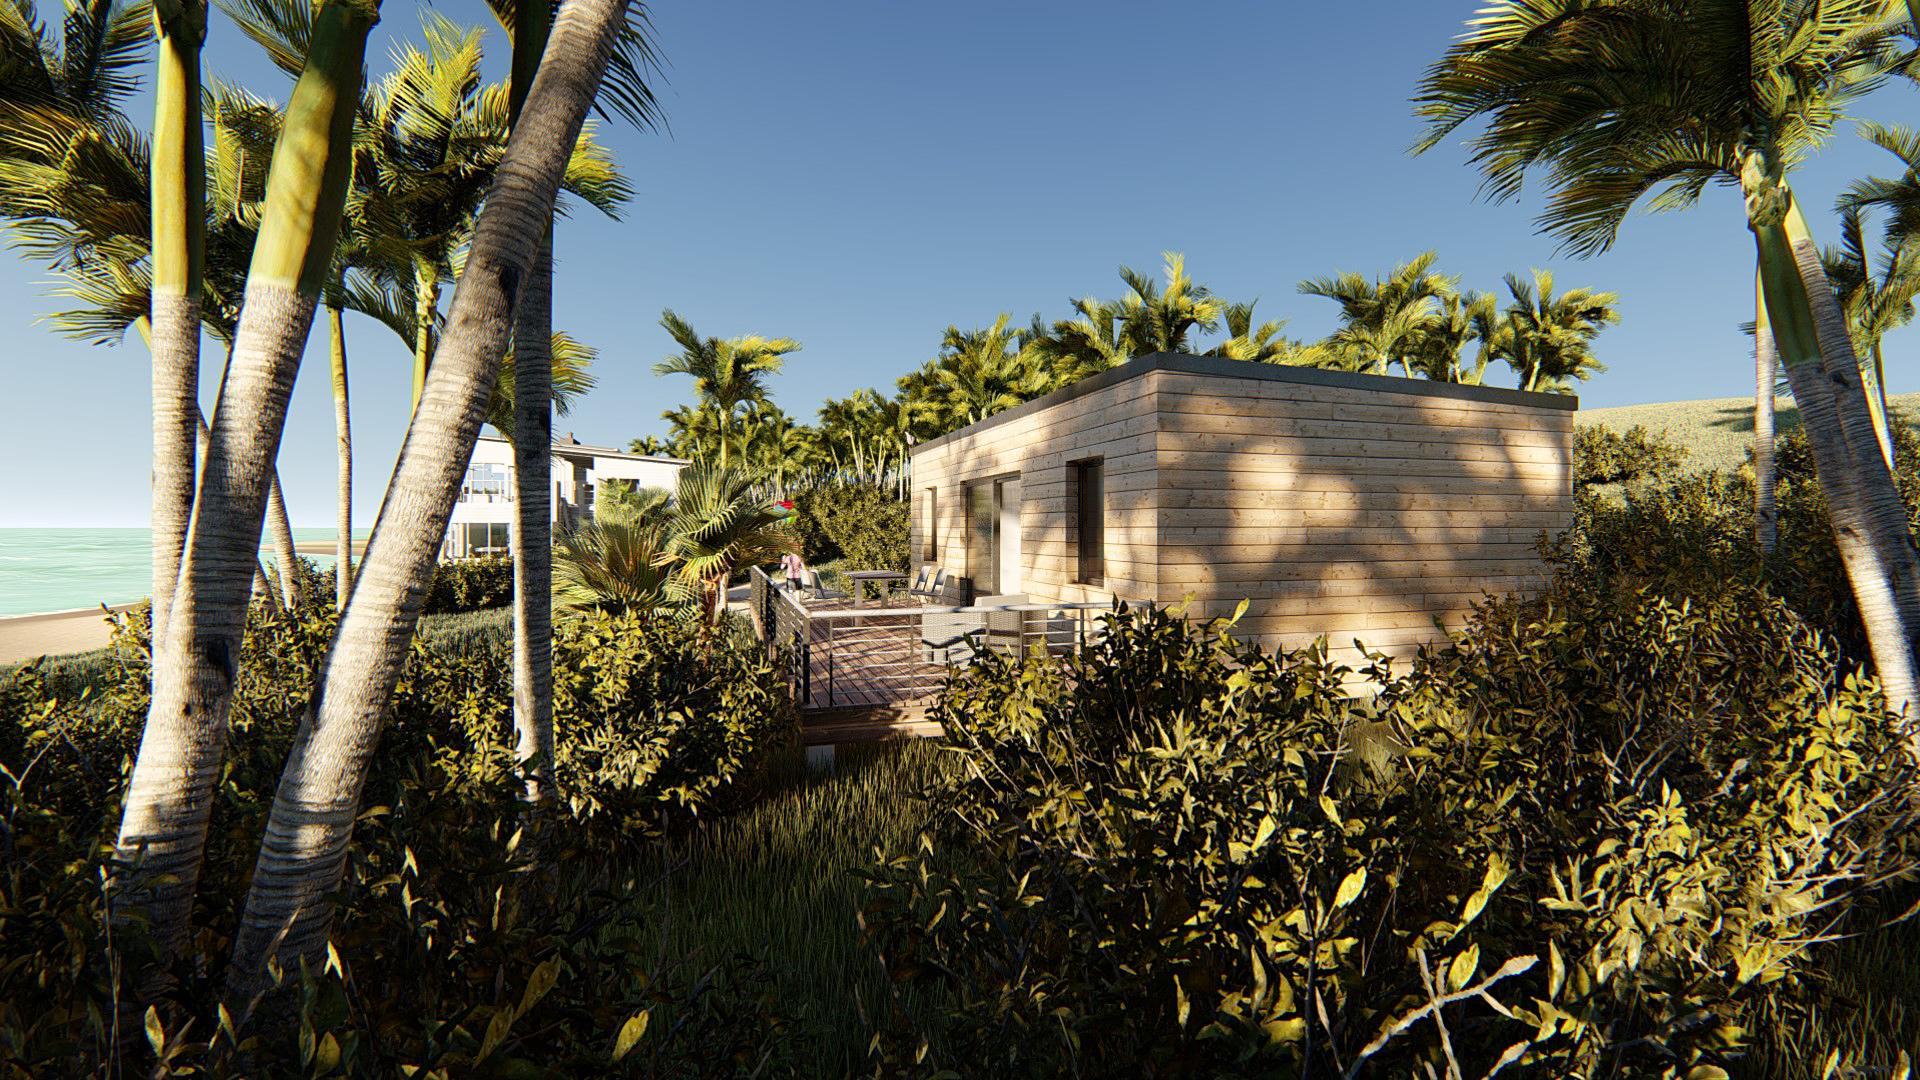 Studio de jardin 45 chalet camping vue vegetation